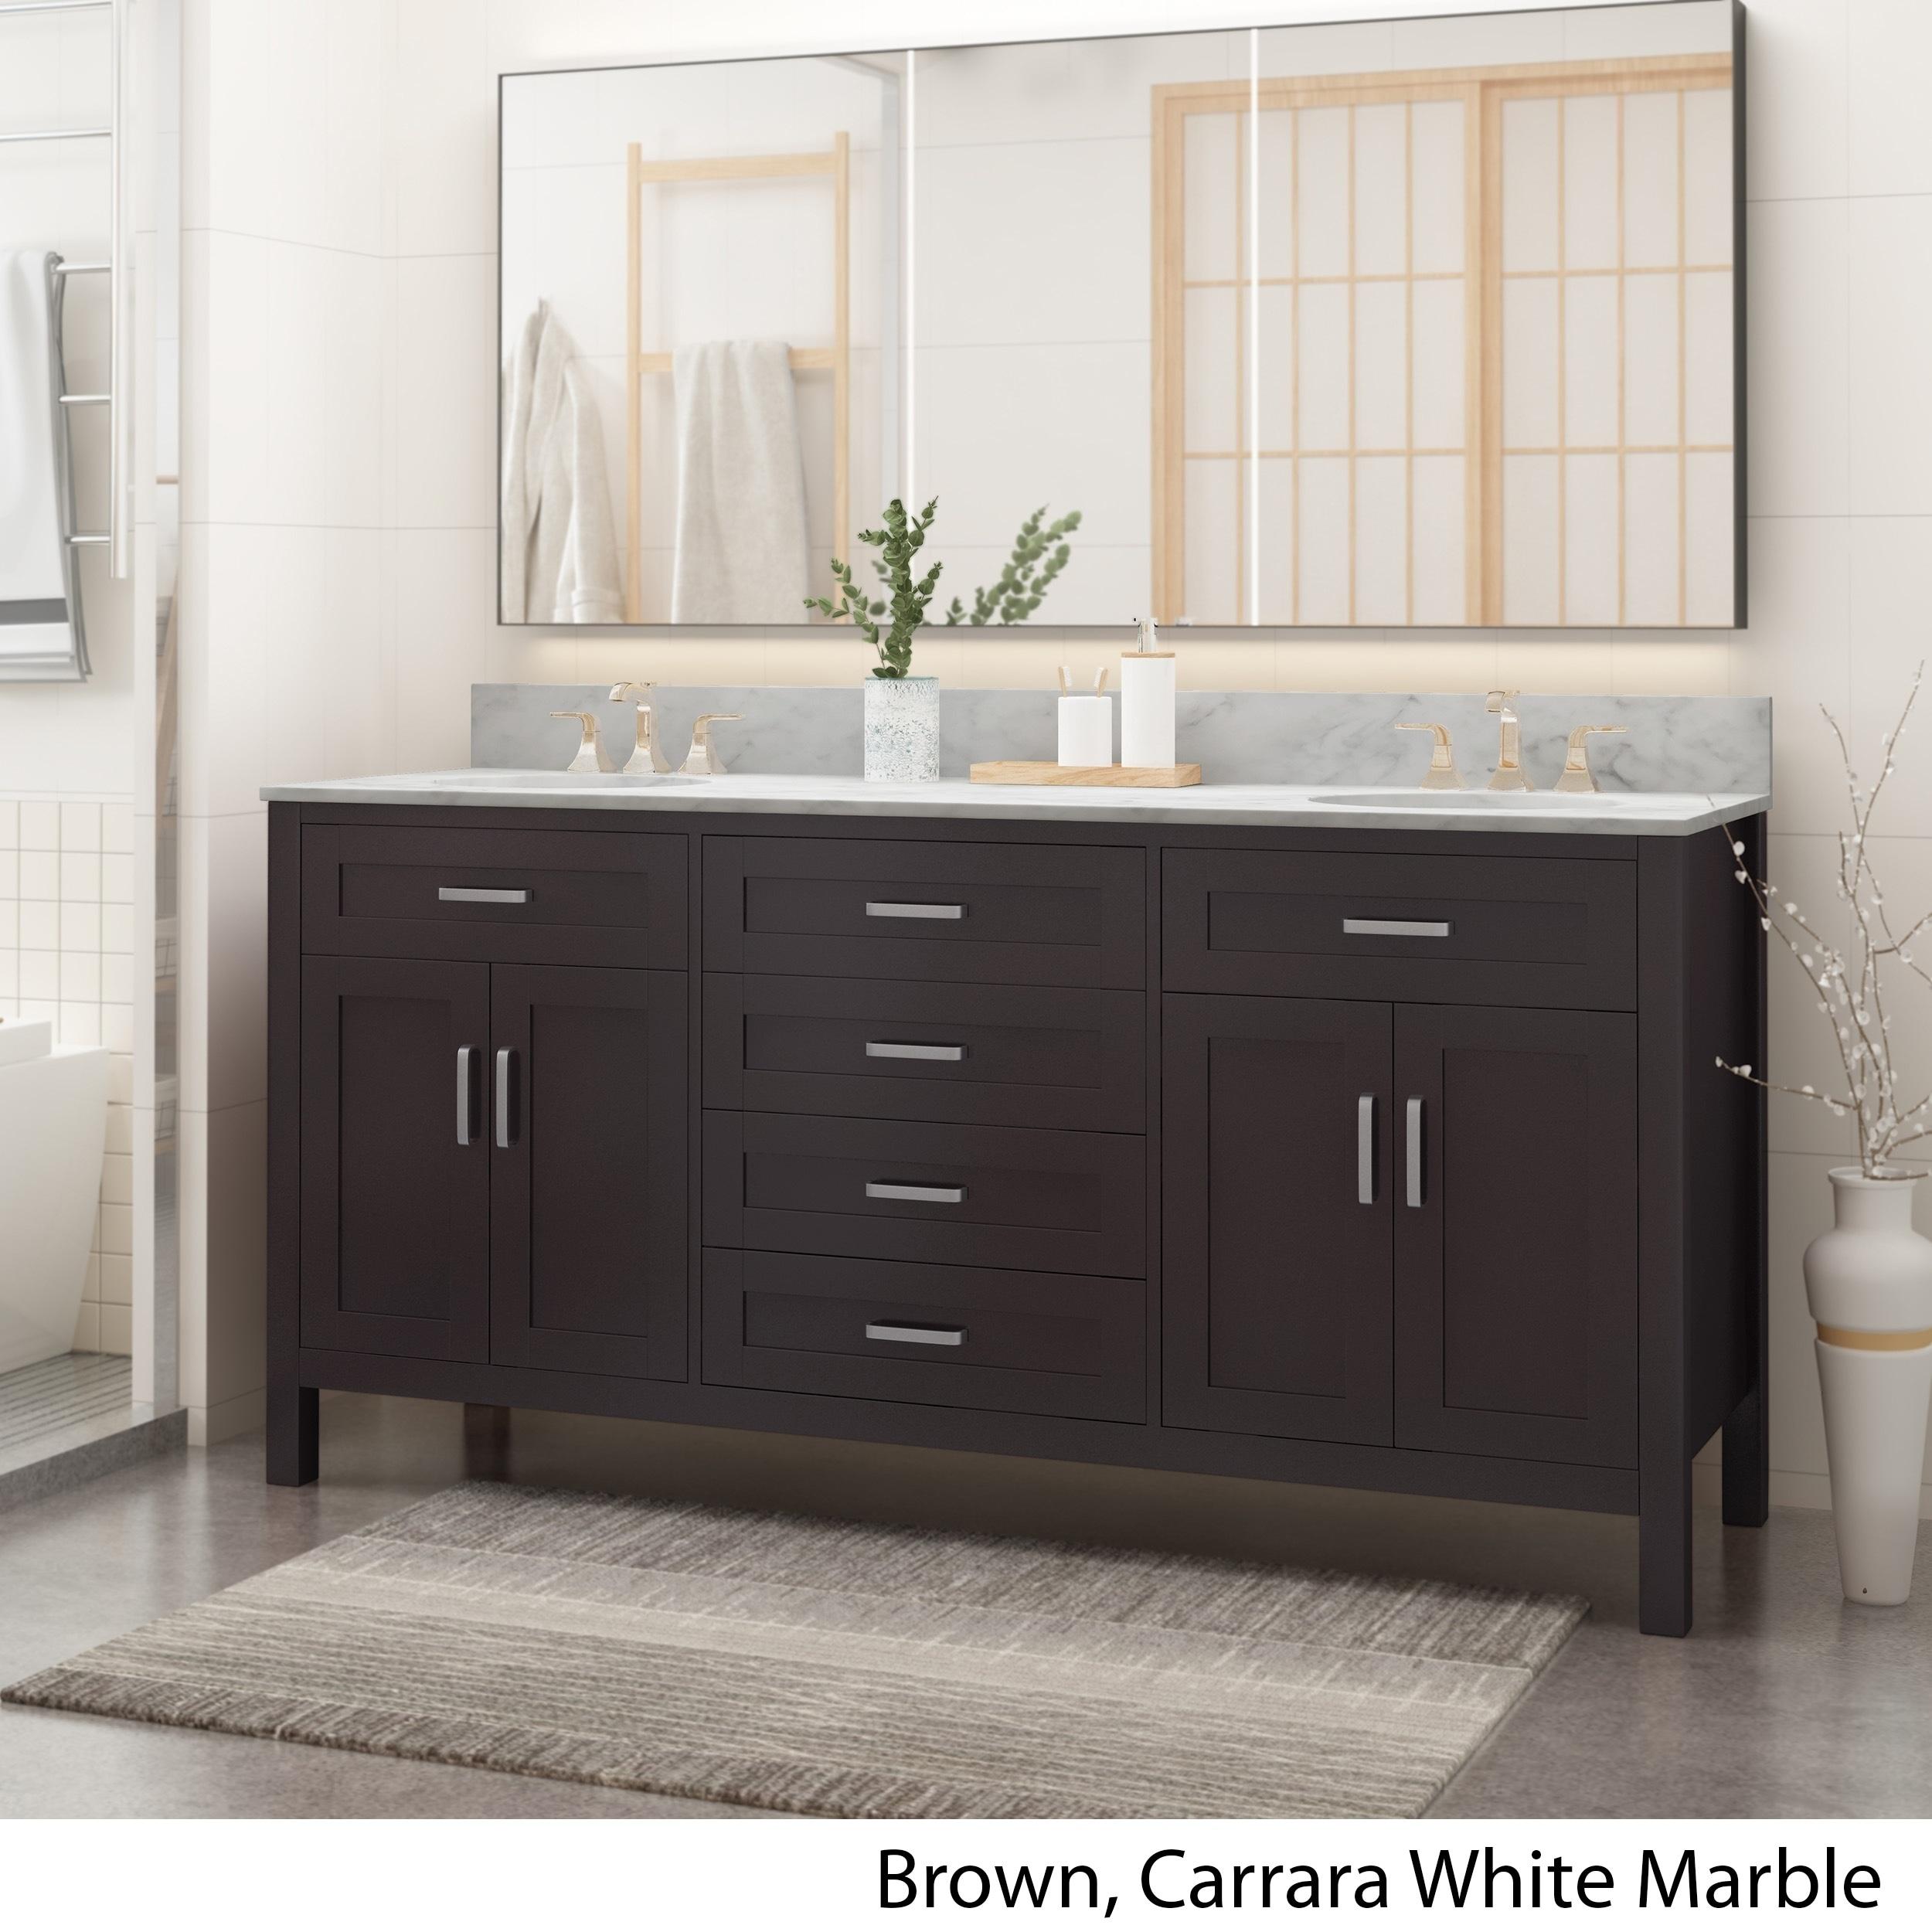 Wood Double Sink Bathroom Vanity